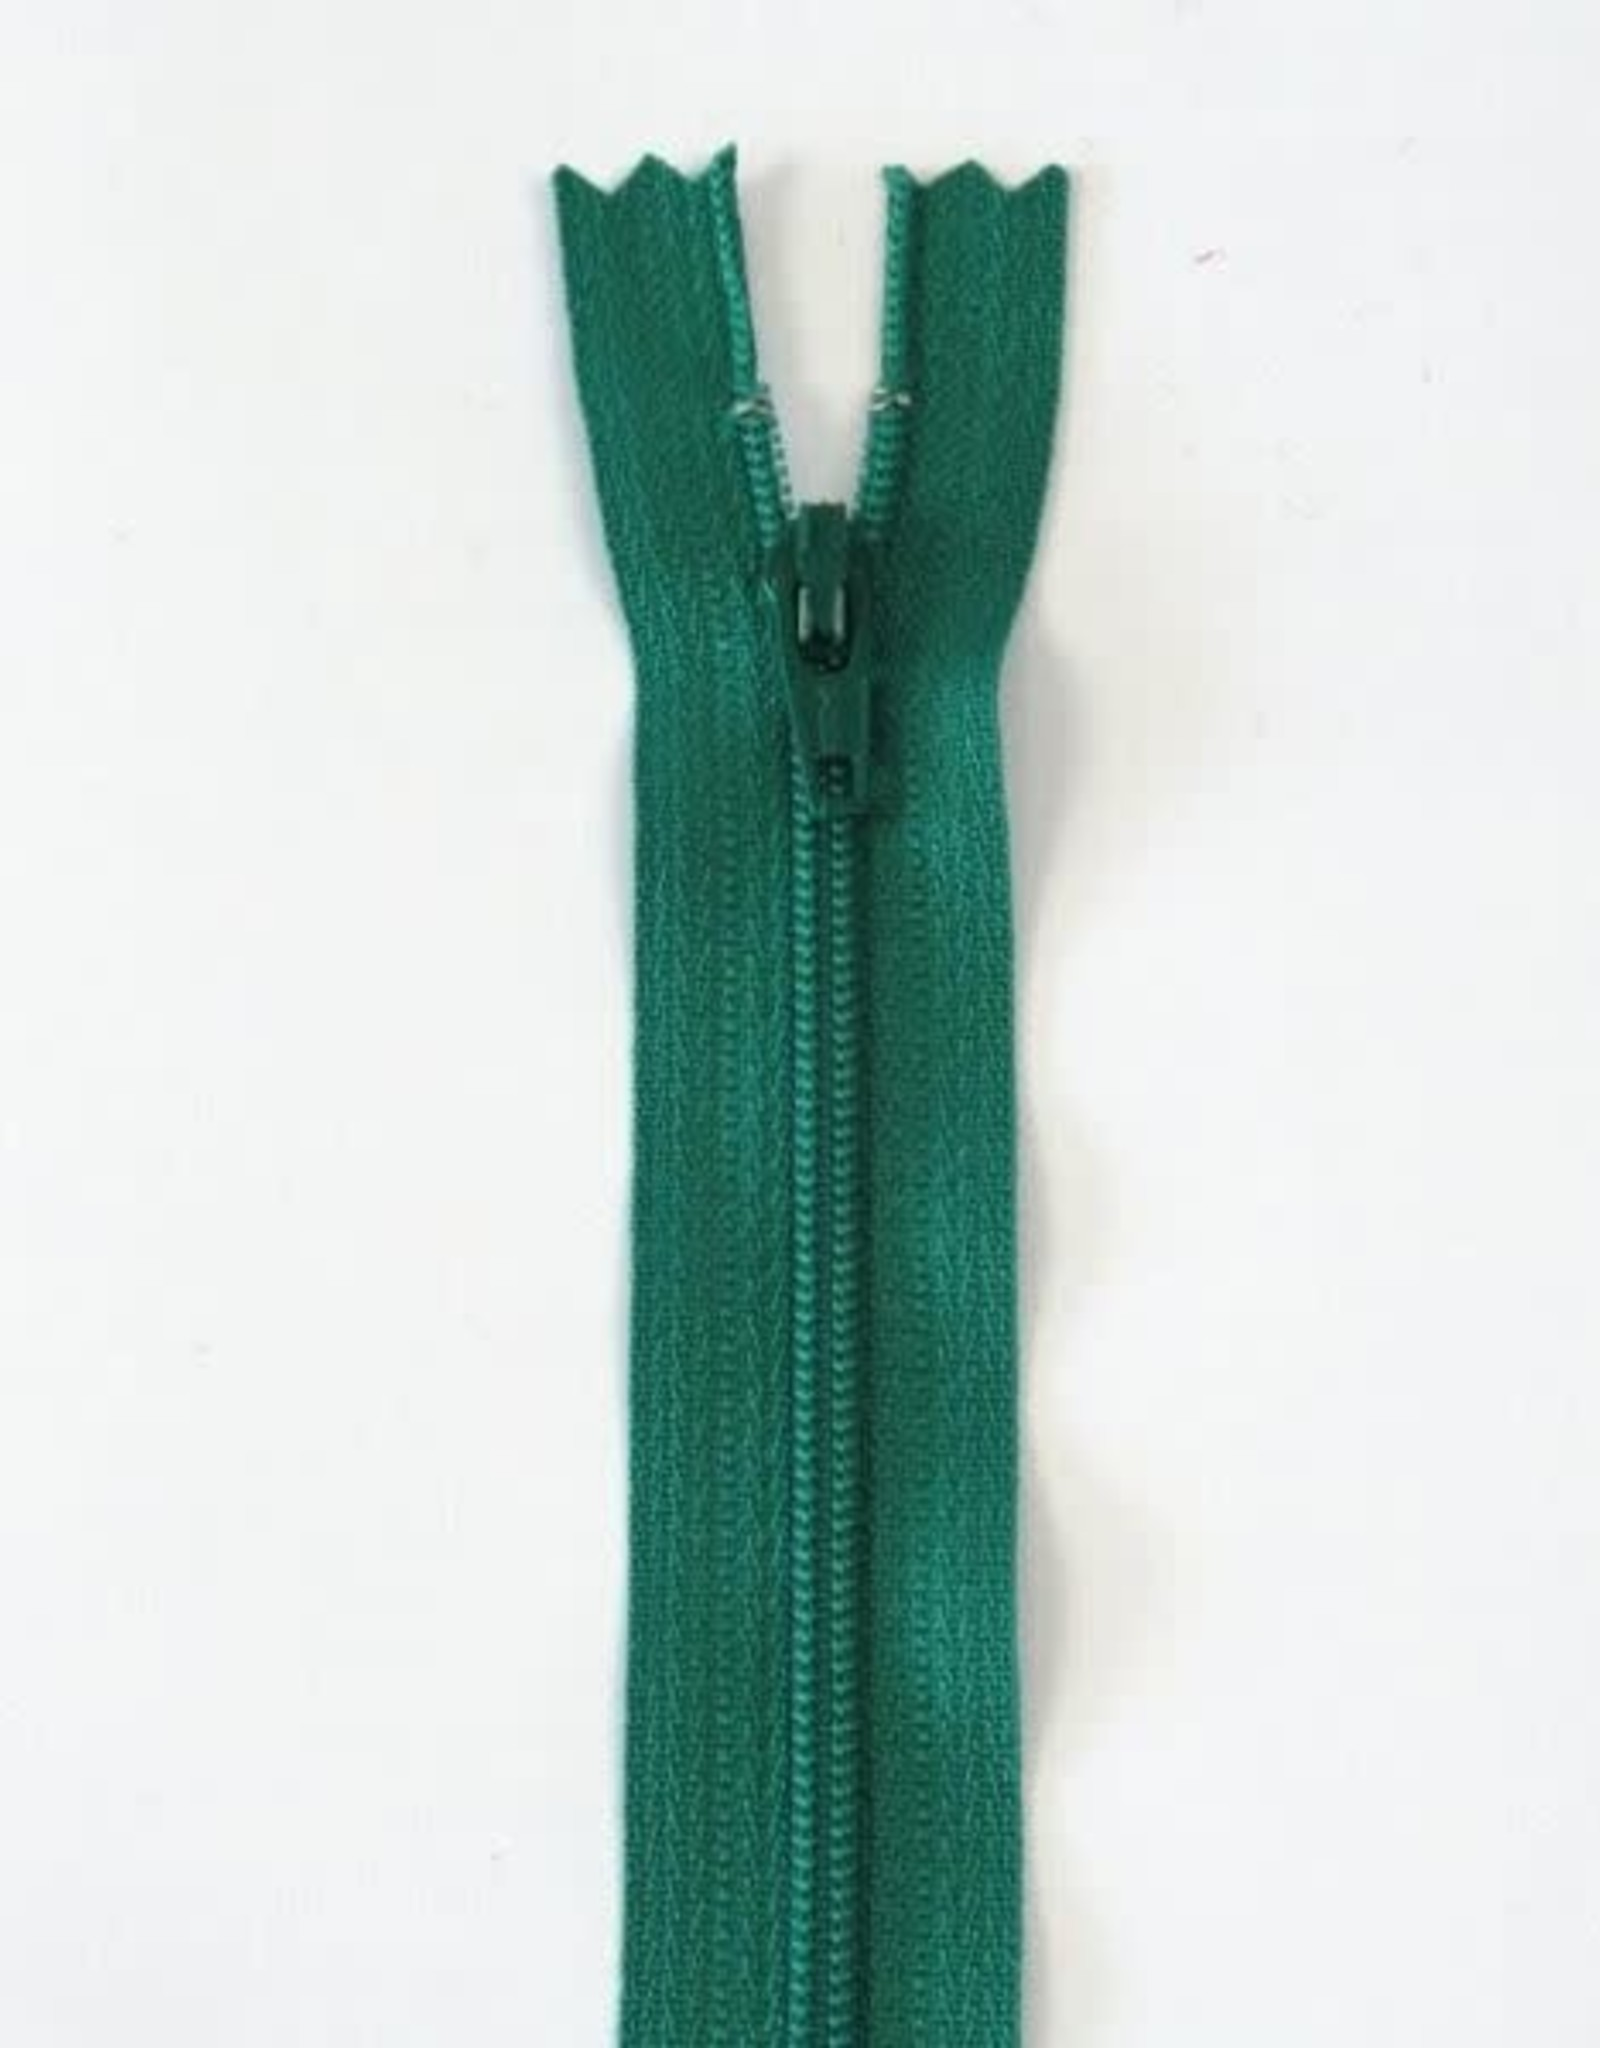 YKK Spiraalrits niet-DB 3mm grasgroen 540-18cm